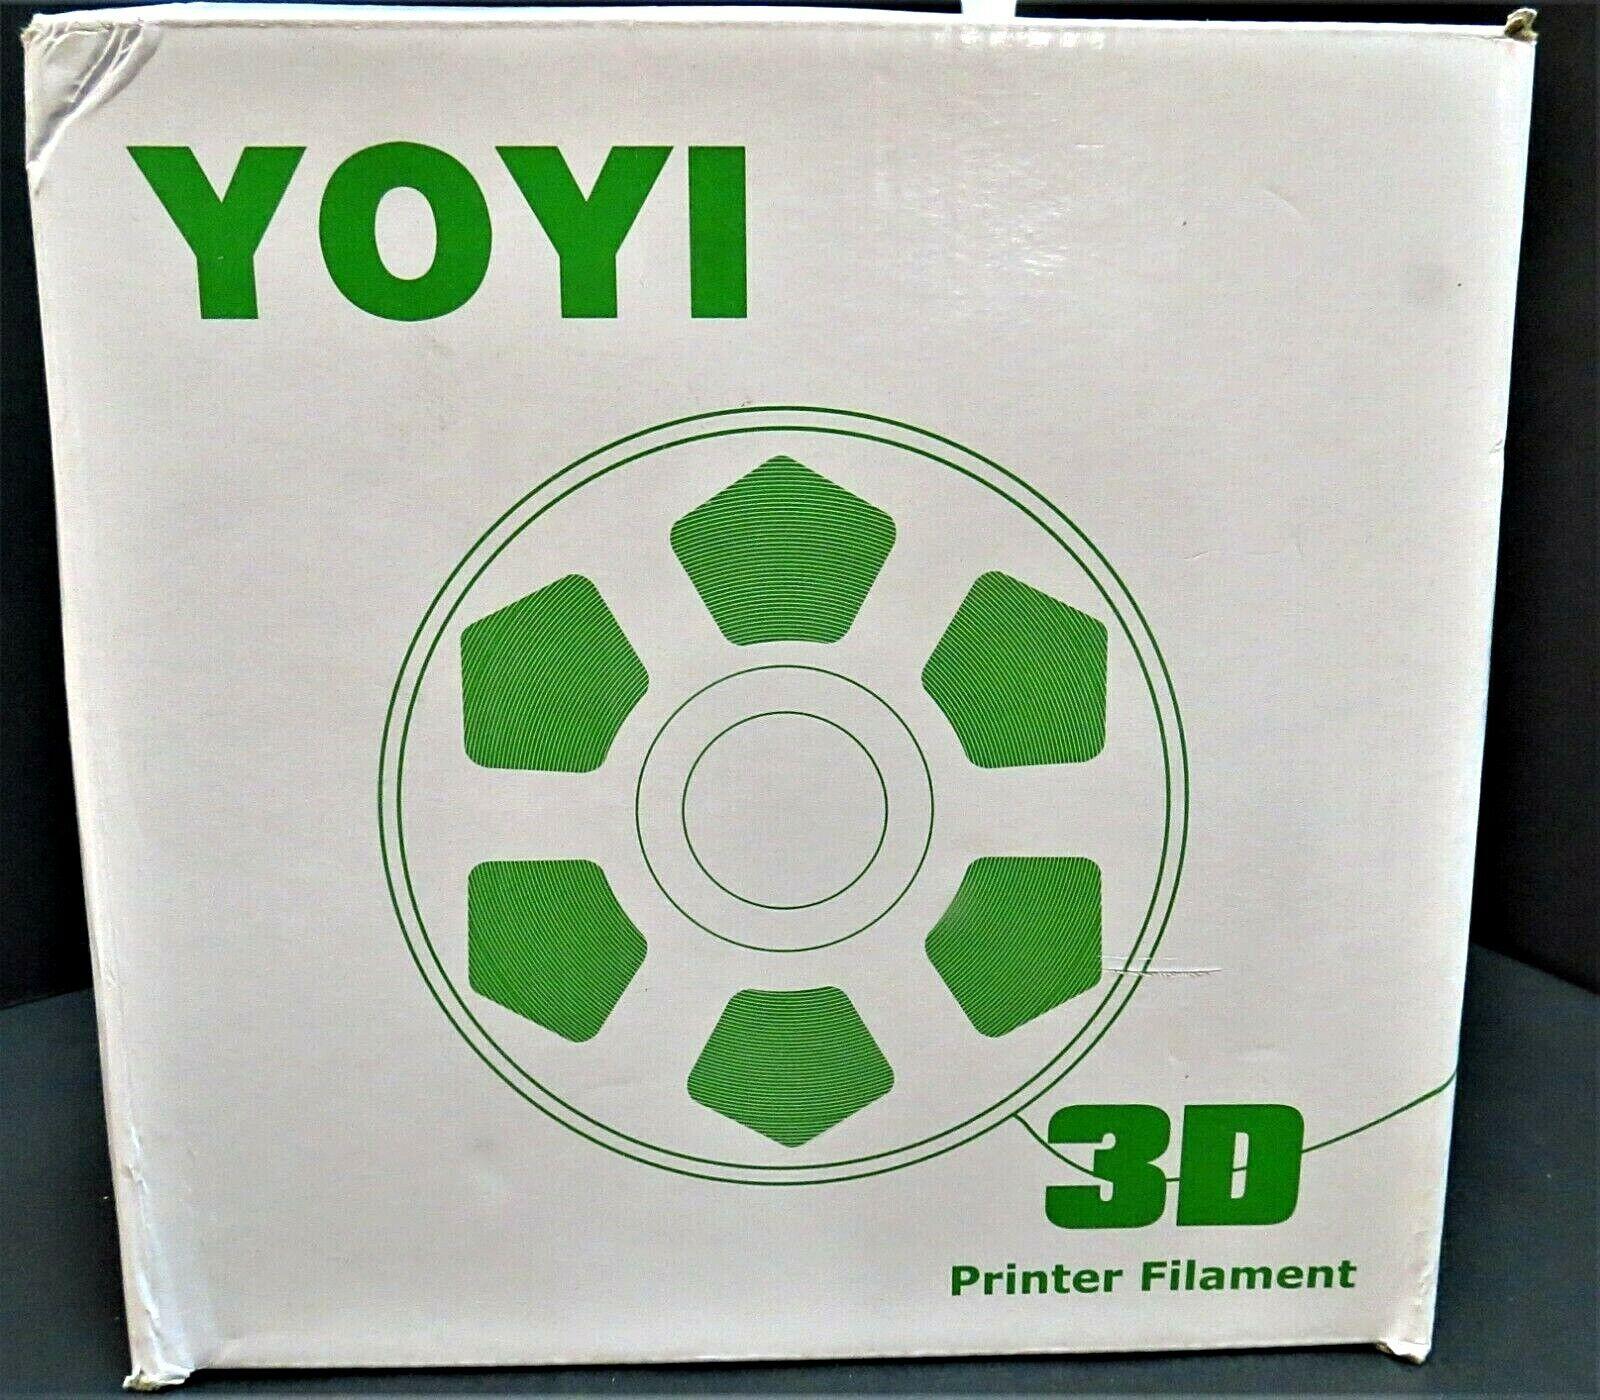 YOYI - Premium 3D Printer Filament Green Dia. 1.75mm Partial Spool